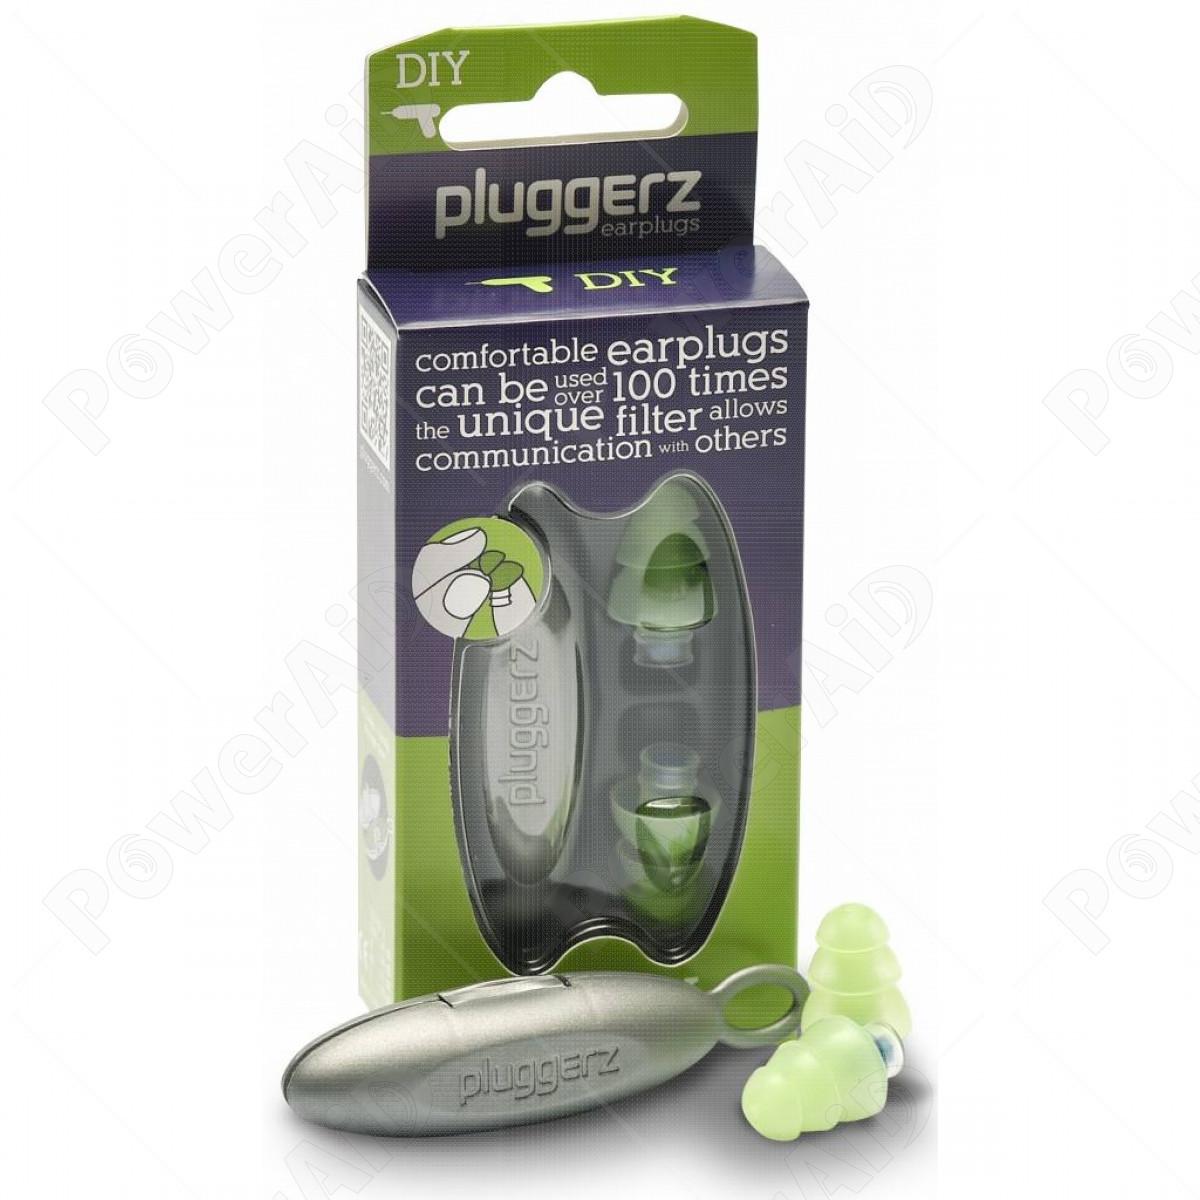 Pluggerz - Hobby